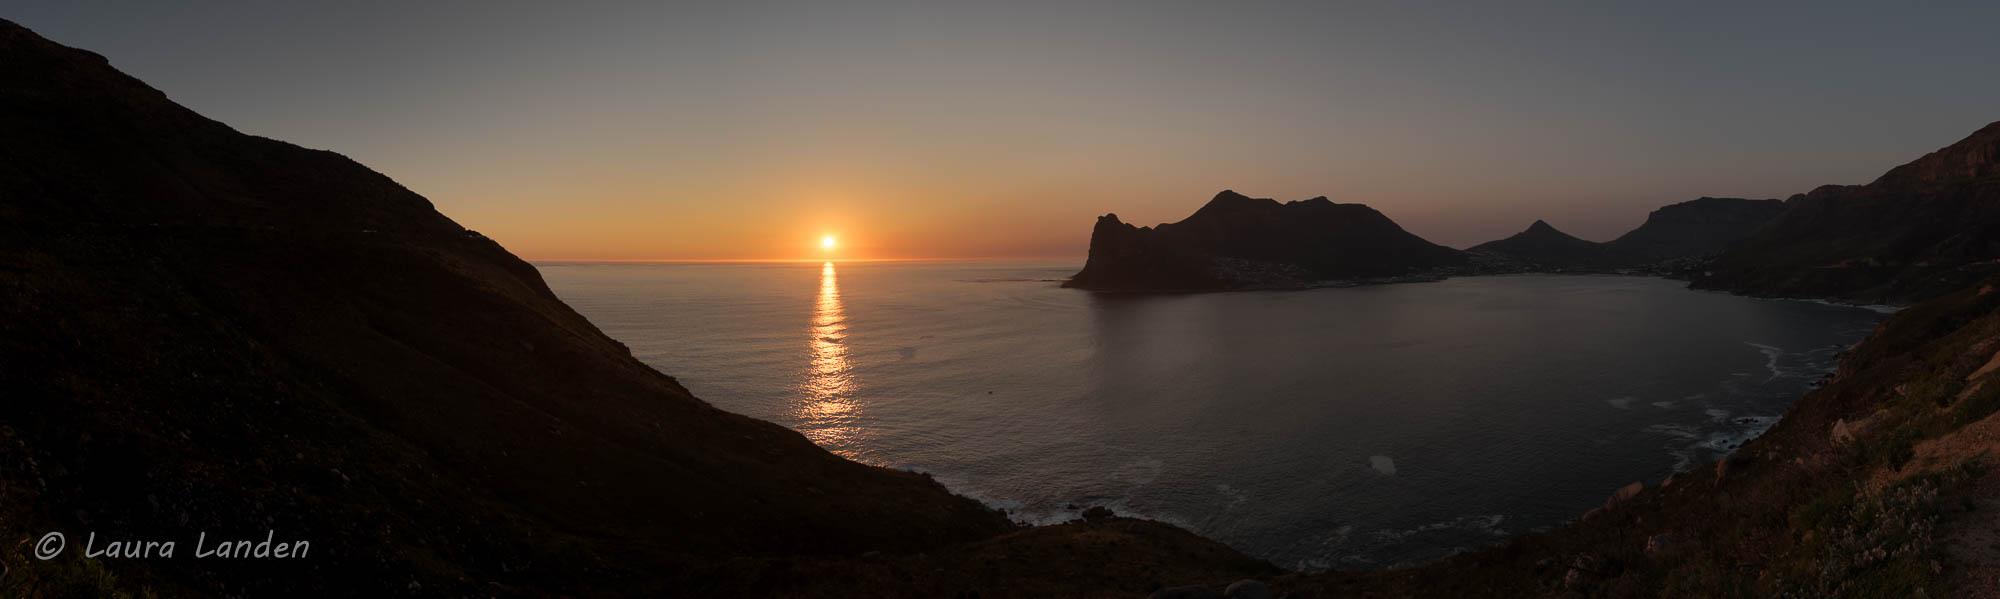 Chapman's Bay Sunset